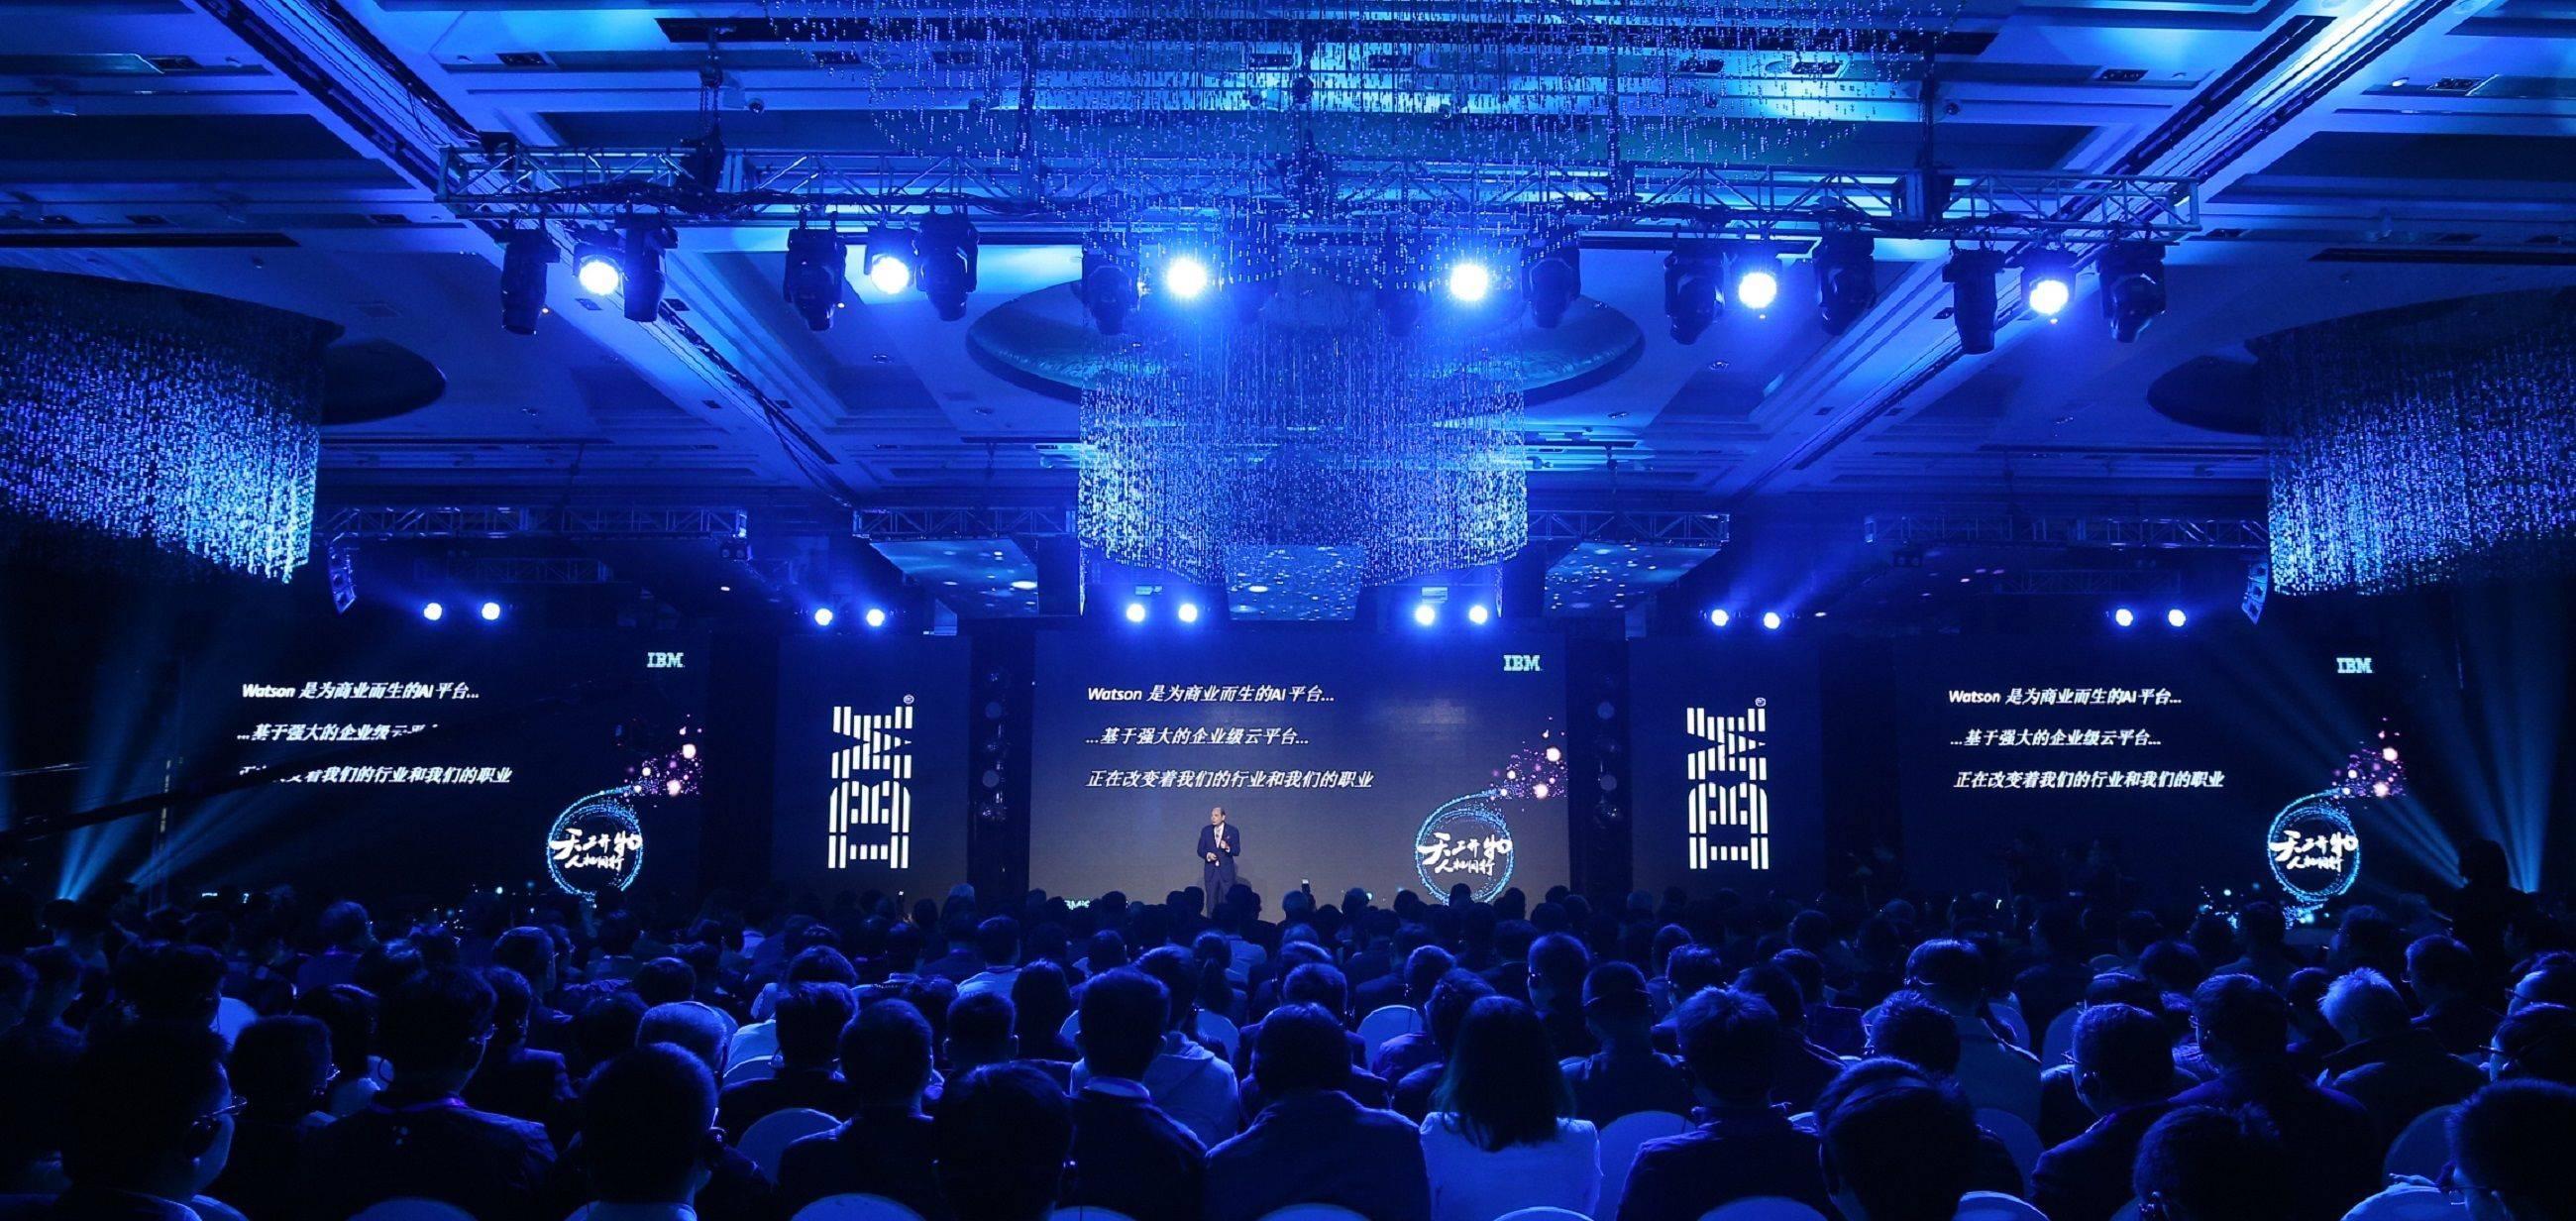 【2017 IBM中国论坛-大会照片】天工开物,人机同行-2017 IBM中国论坛.jpg